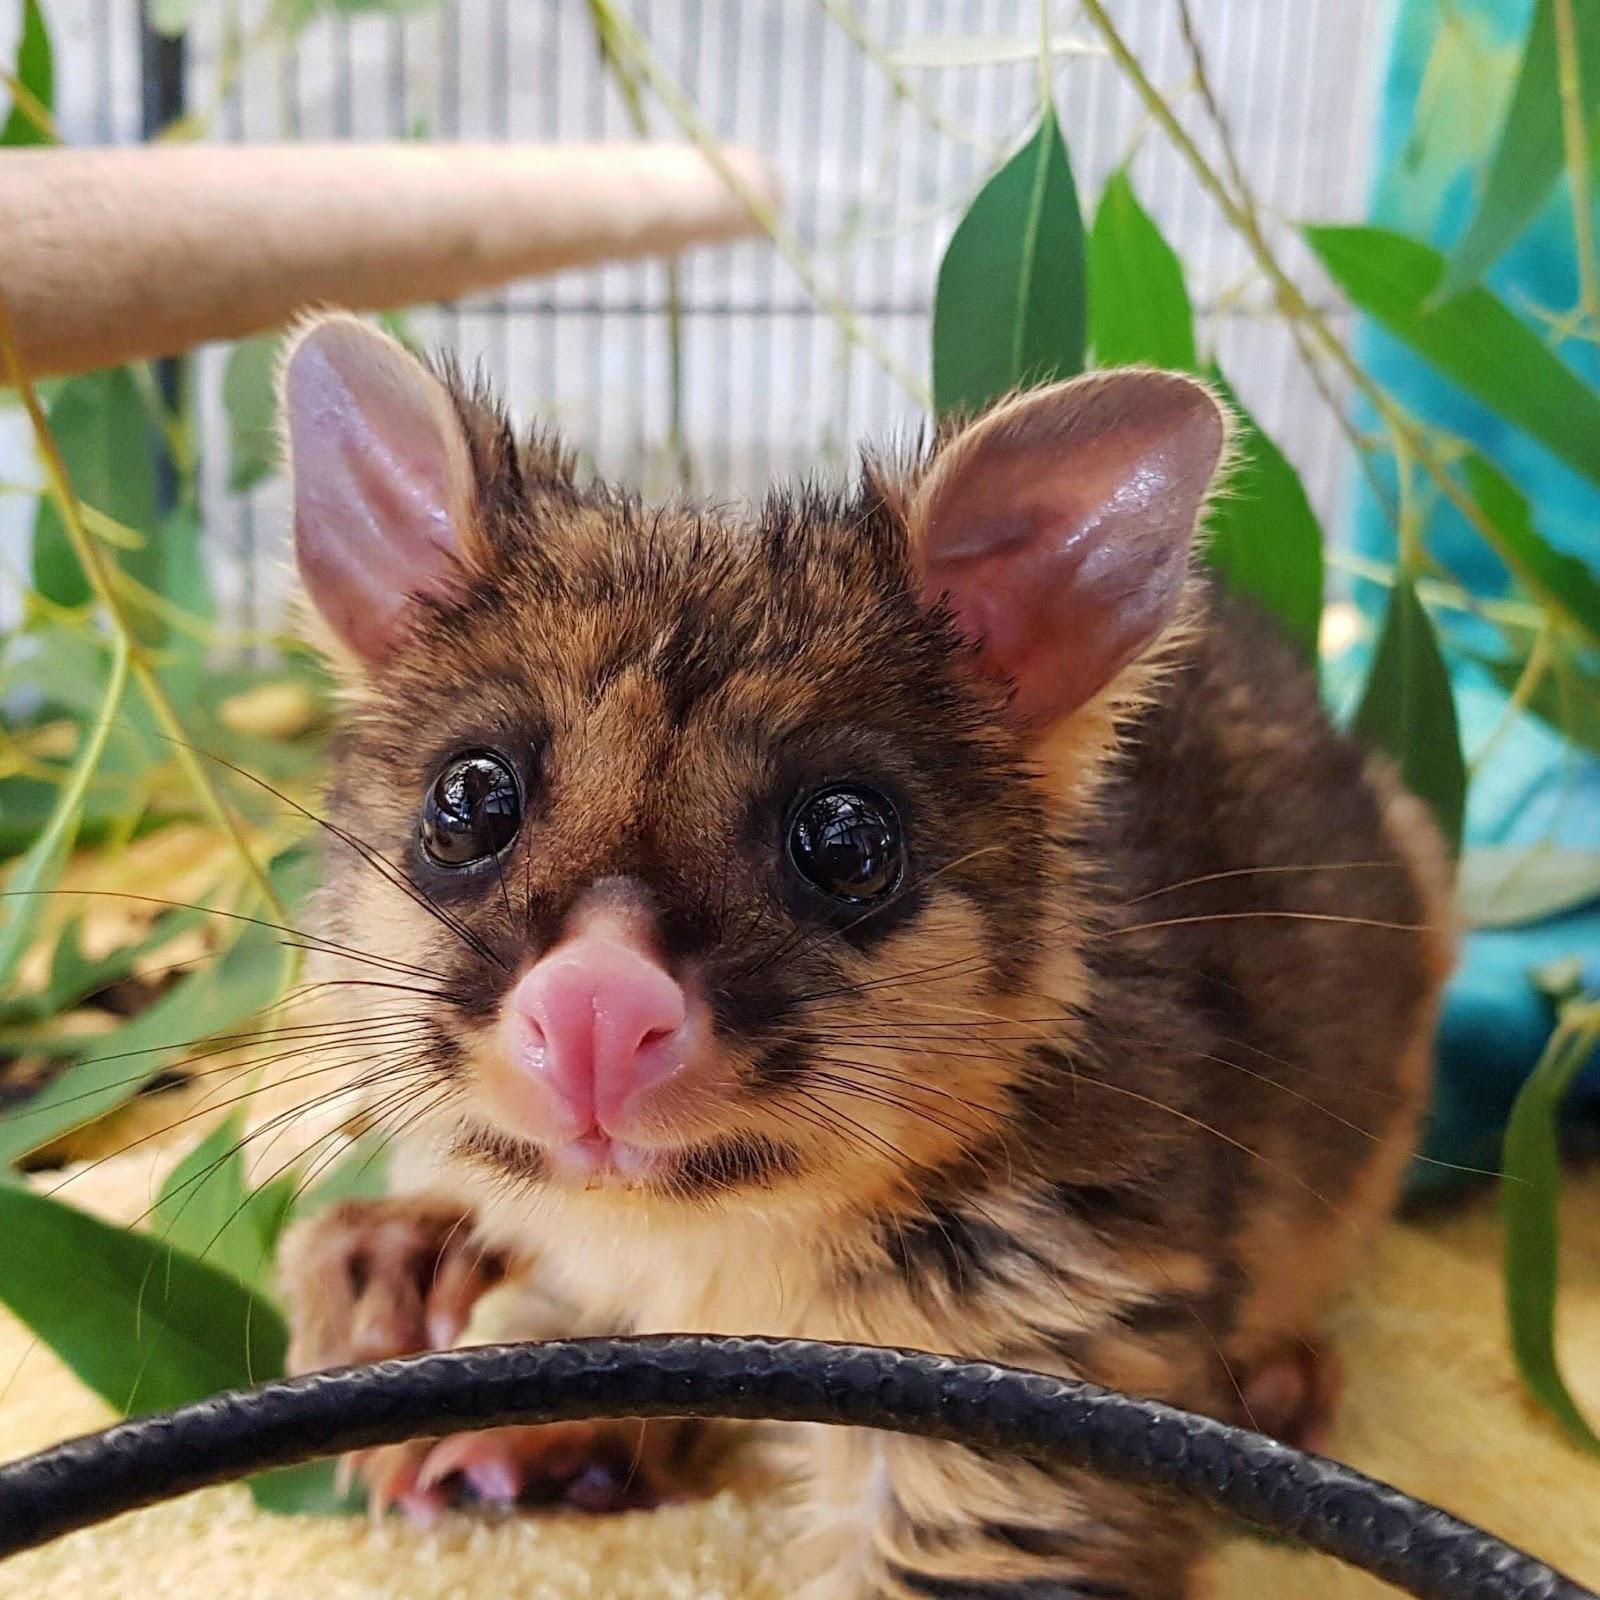 Zoo News Digest: Zoo News Digest 16th April 2018 (ZooNews 989)